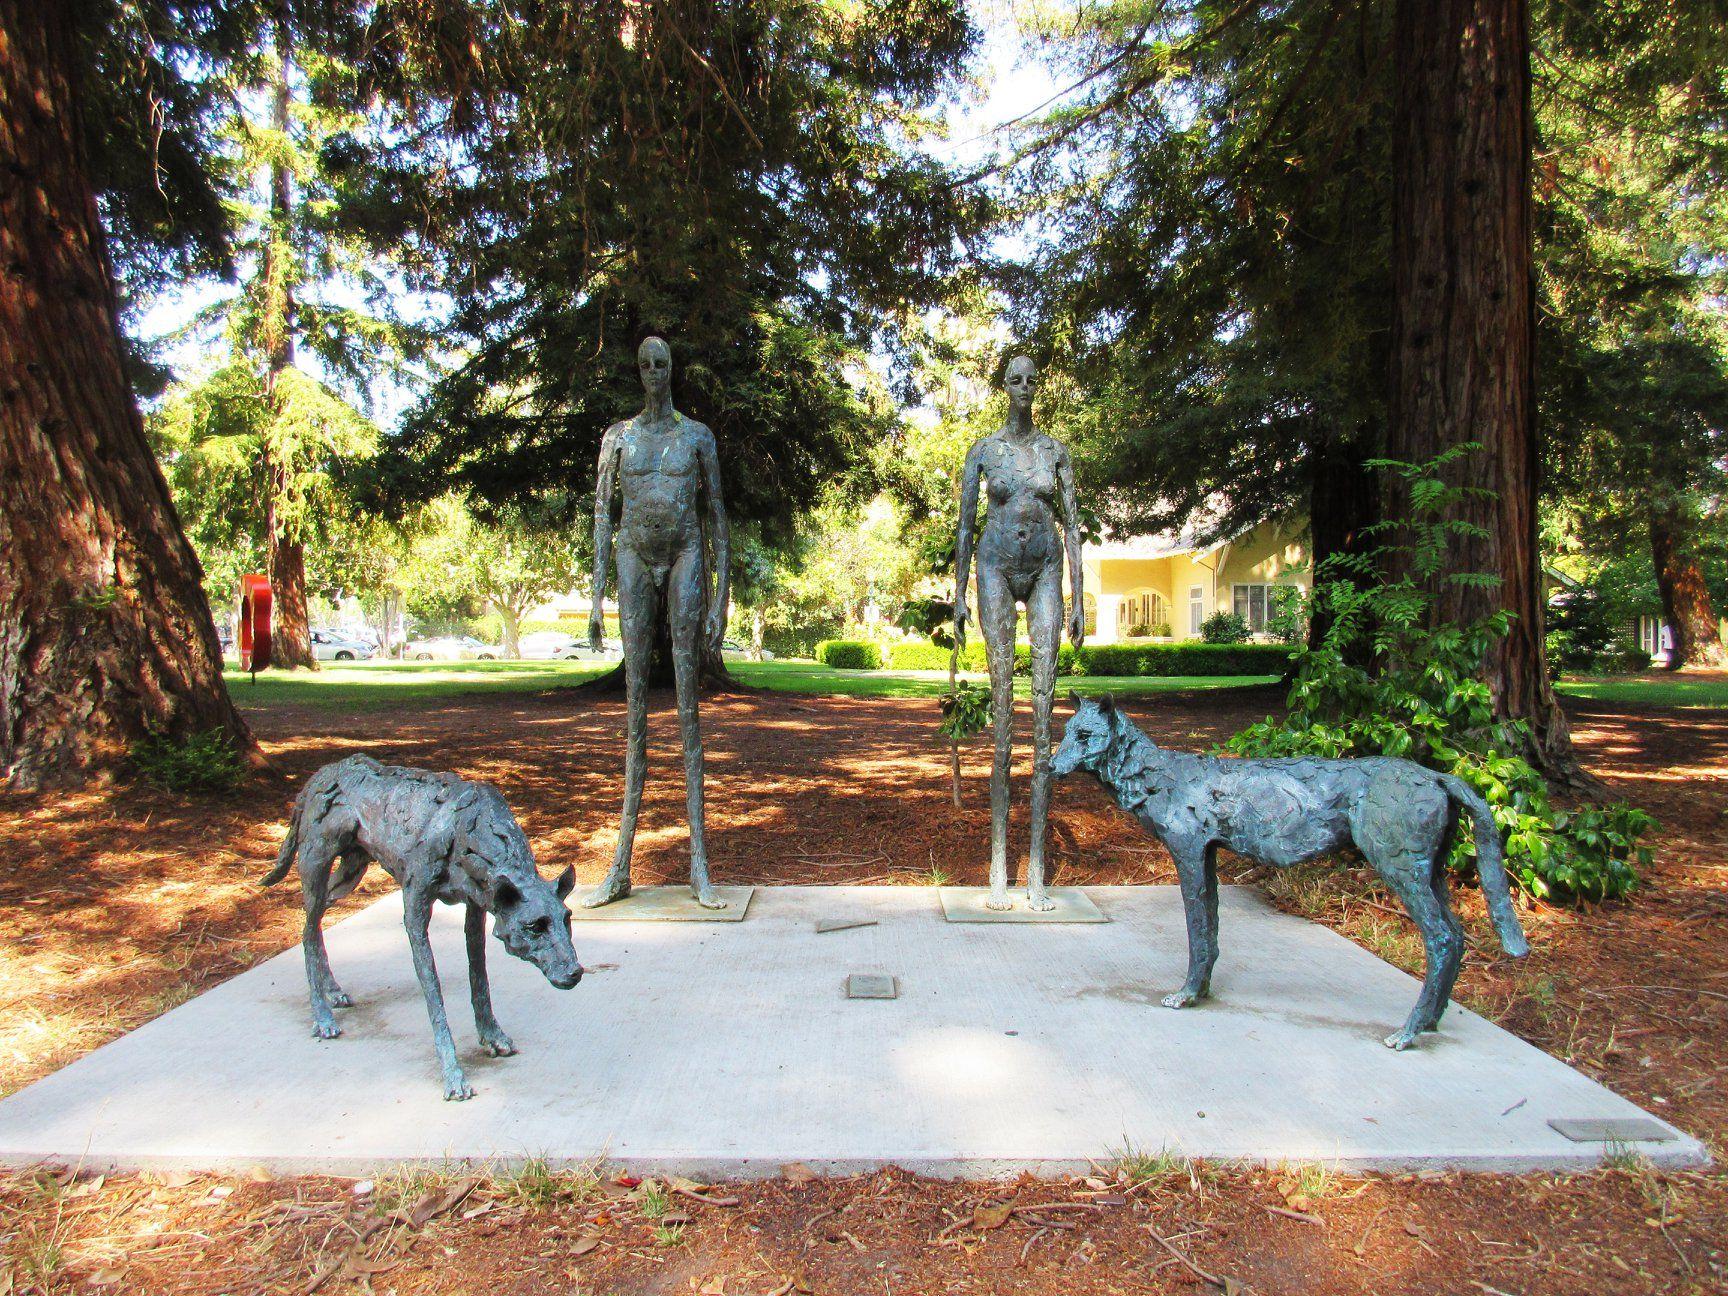 Craigslist Bay Area Pets San Jose - Pets and Animal Educations